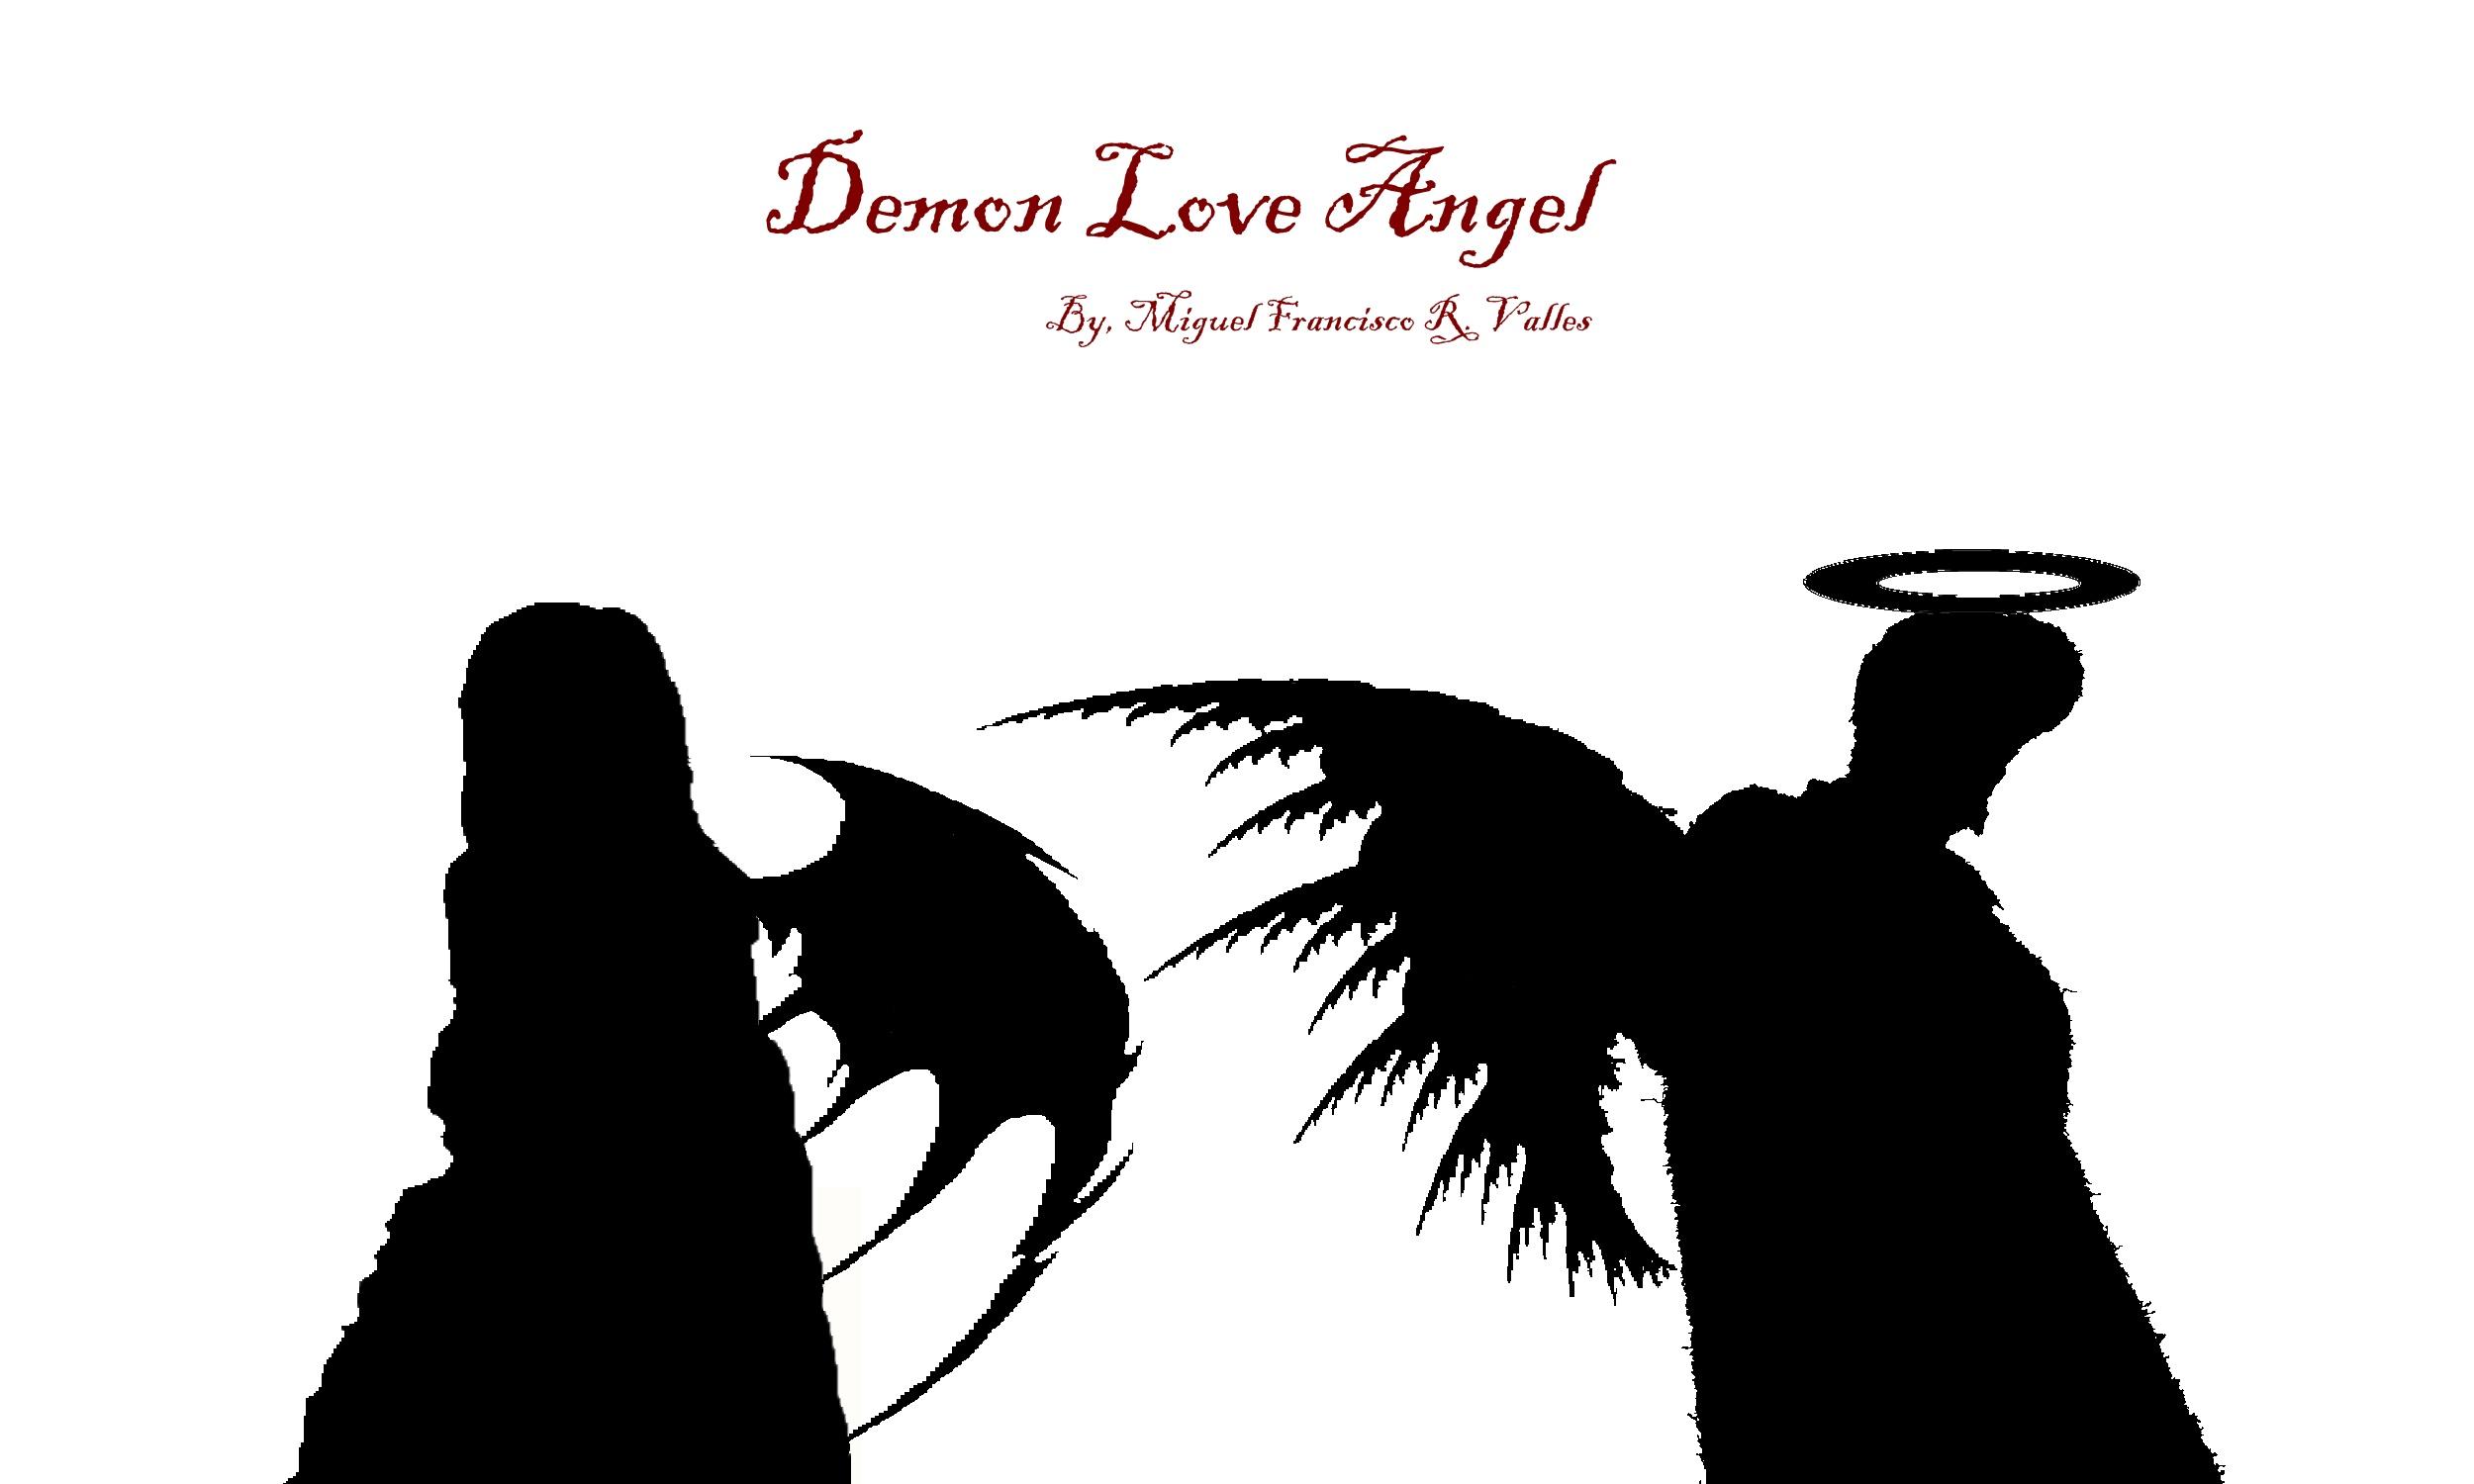 devil love angel